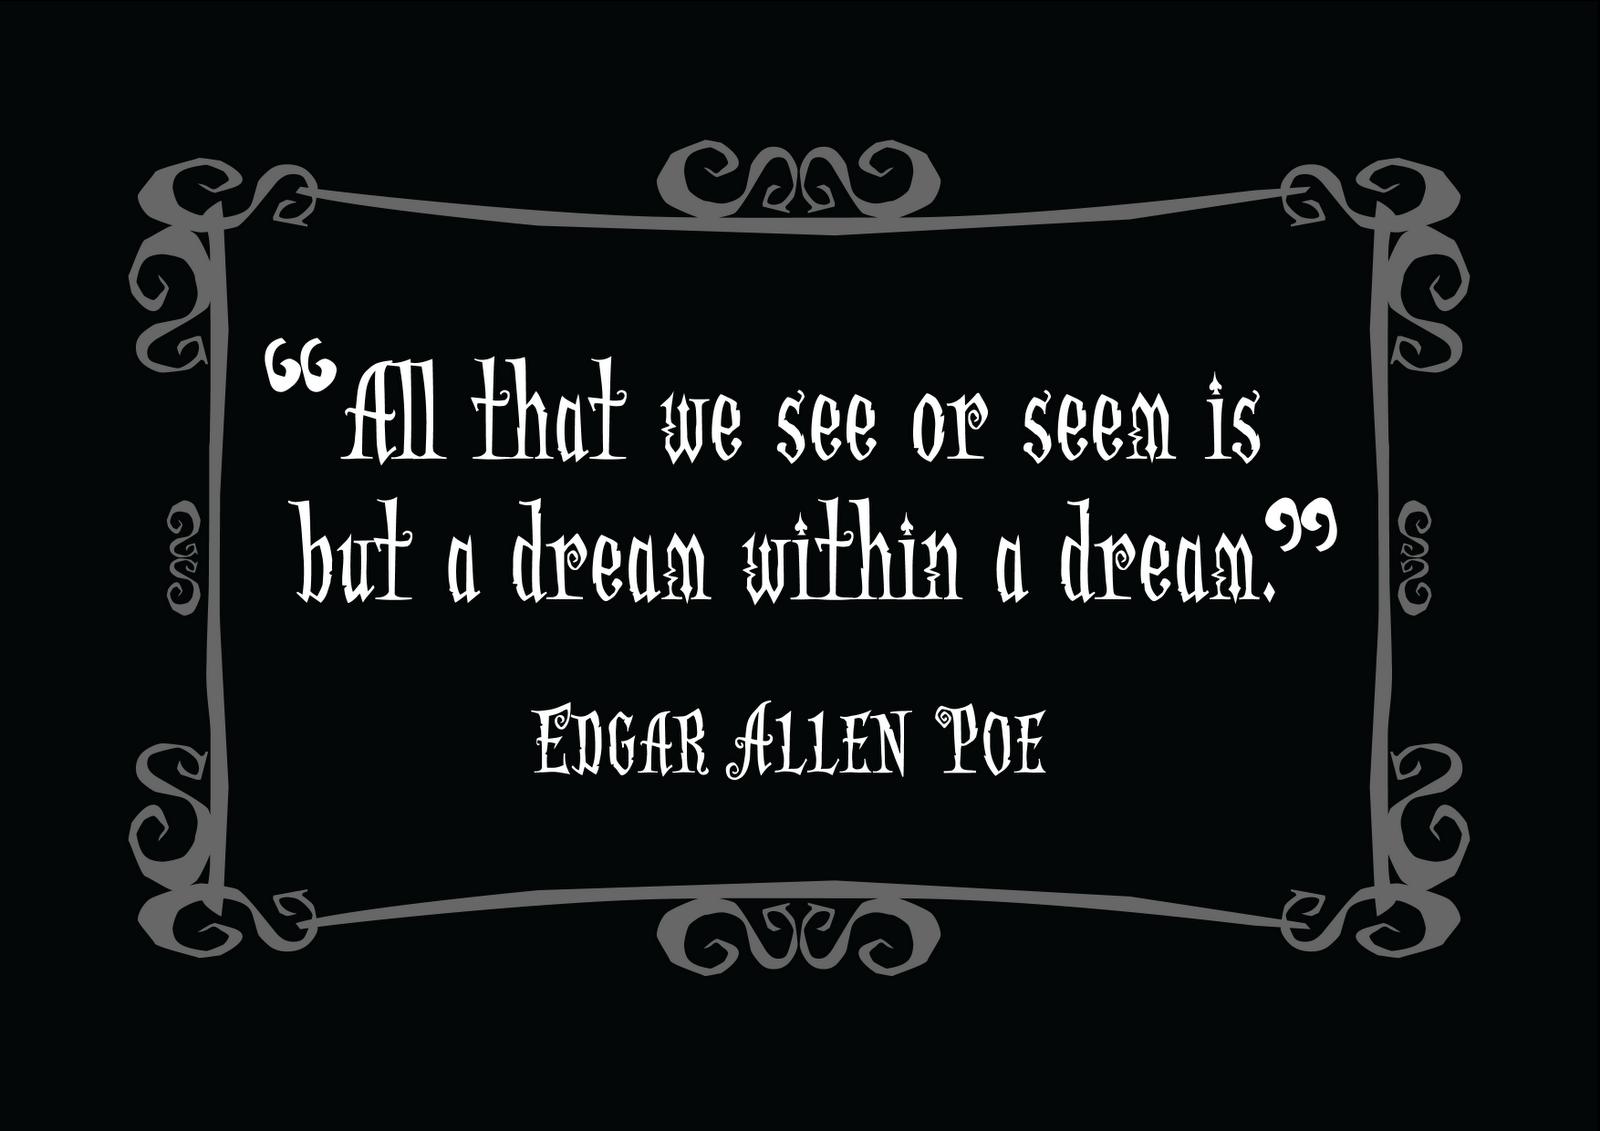 Edgar Allan Poe's quote #5